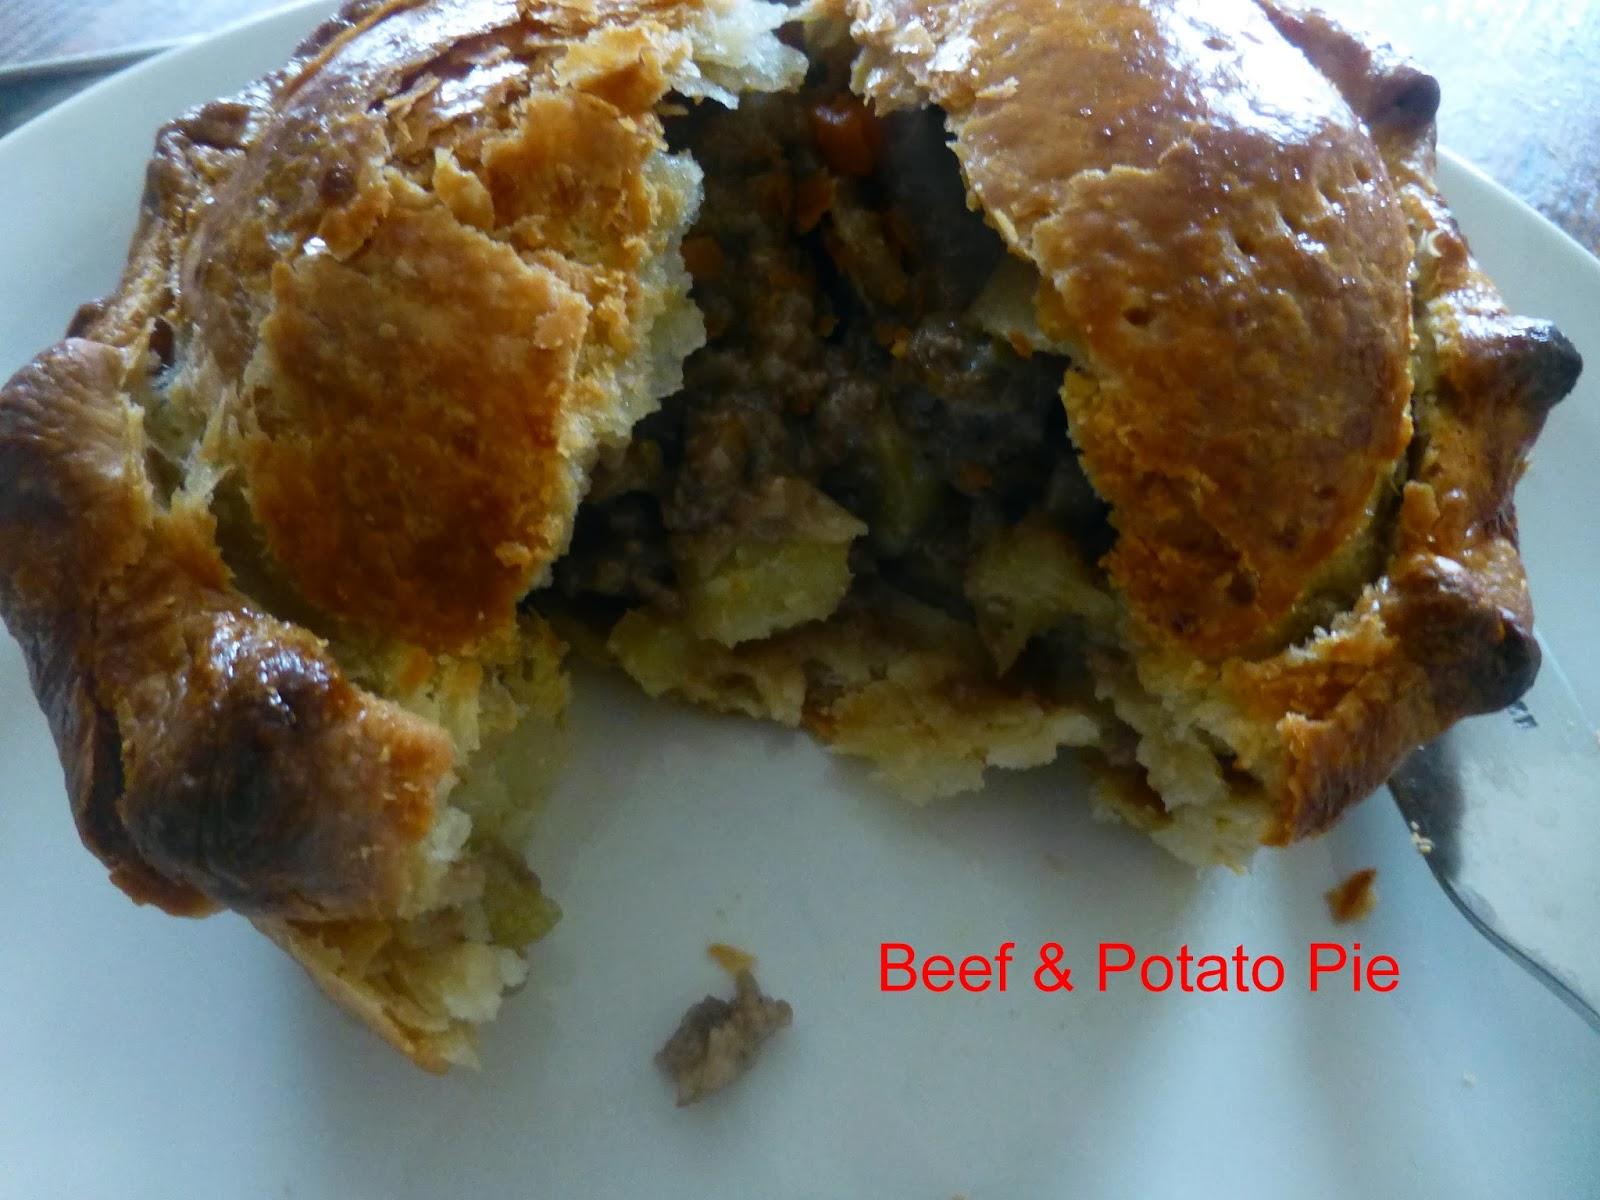 RESTAURANTS AND FOOD: West Cork Pies